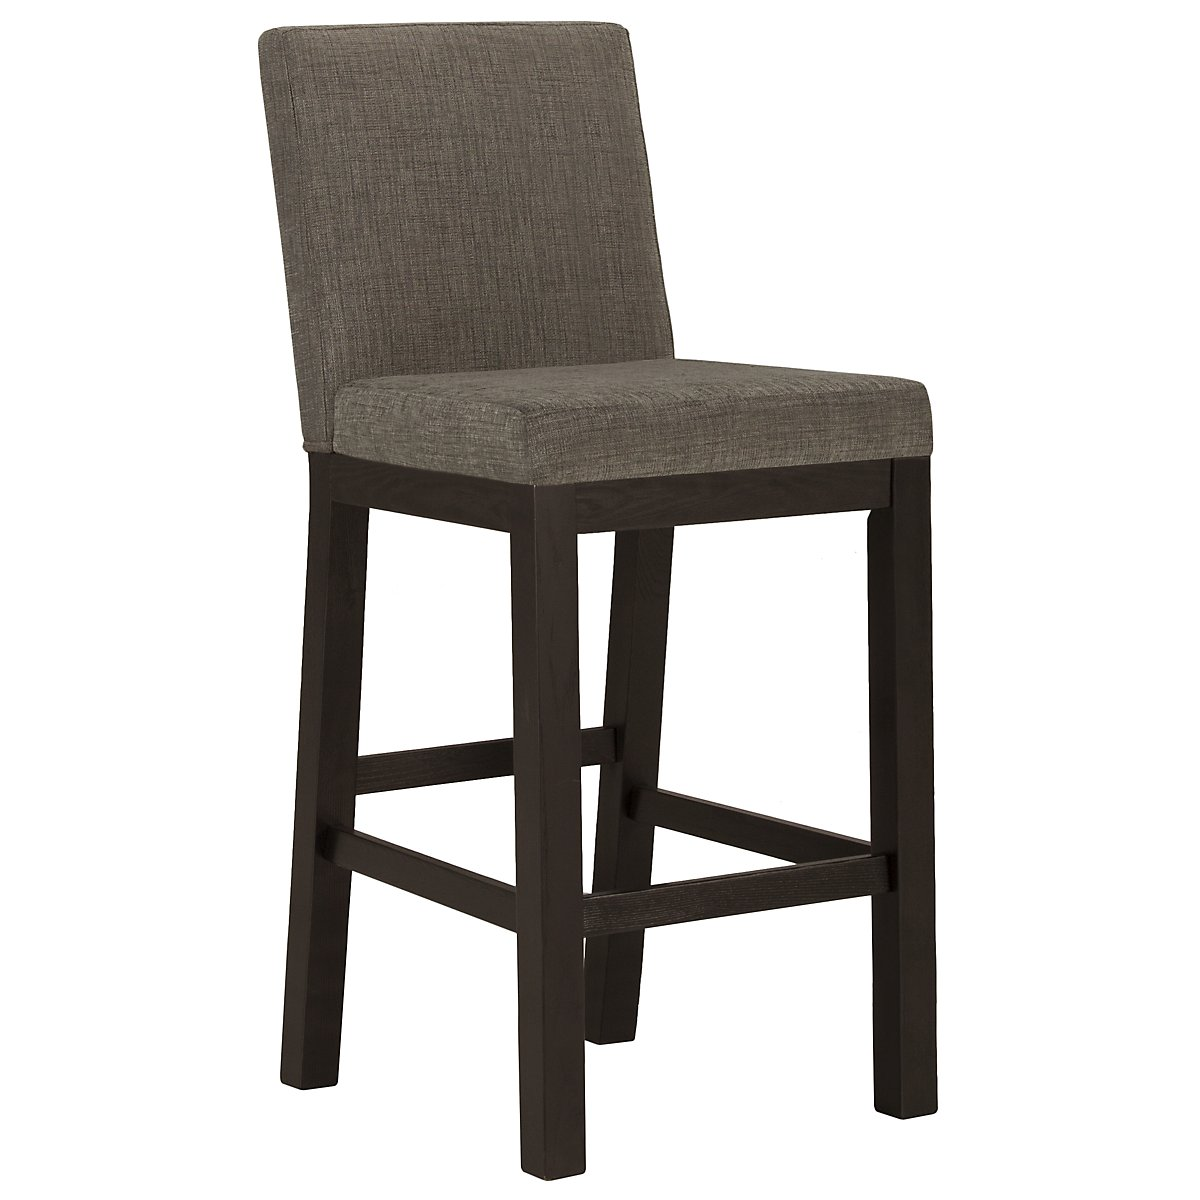 "Tocara Dark Tone 30"" Upholstered Barstool"